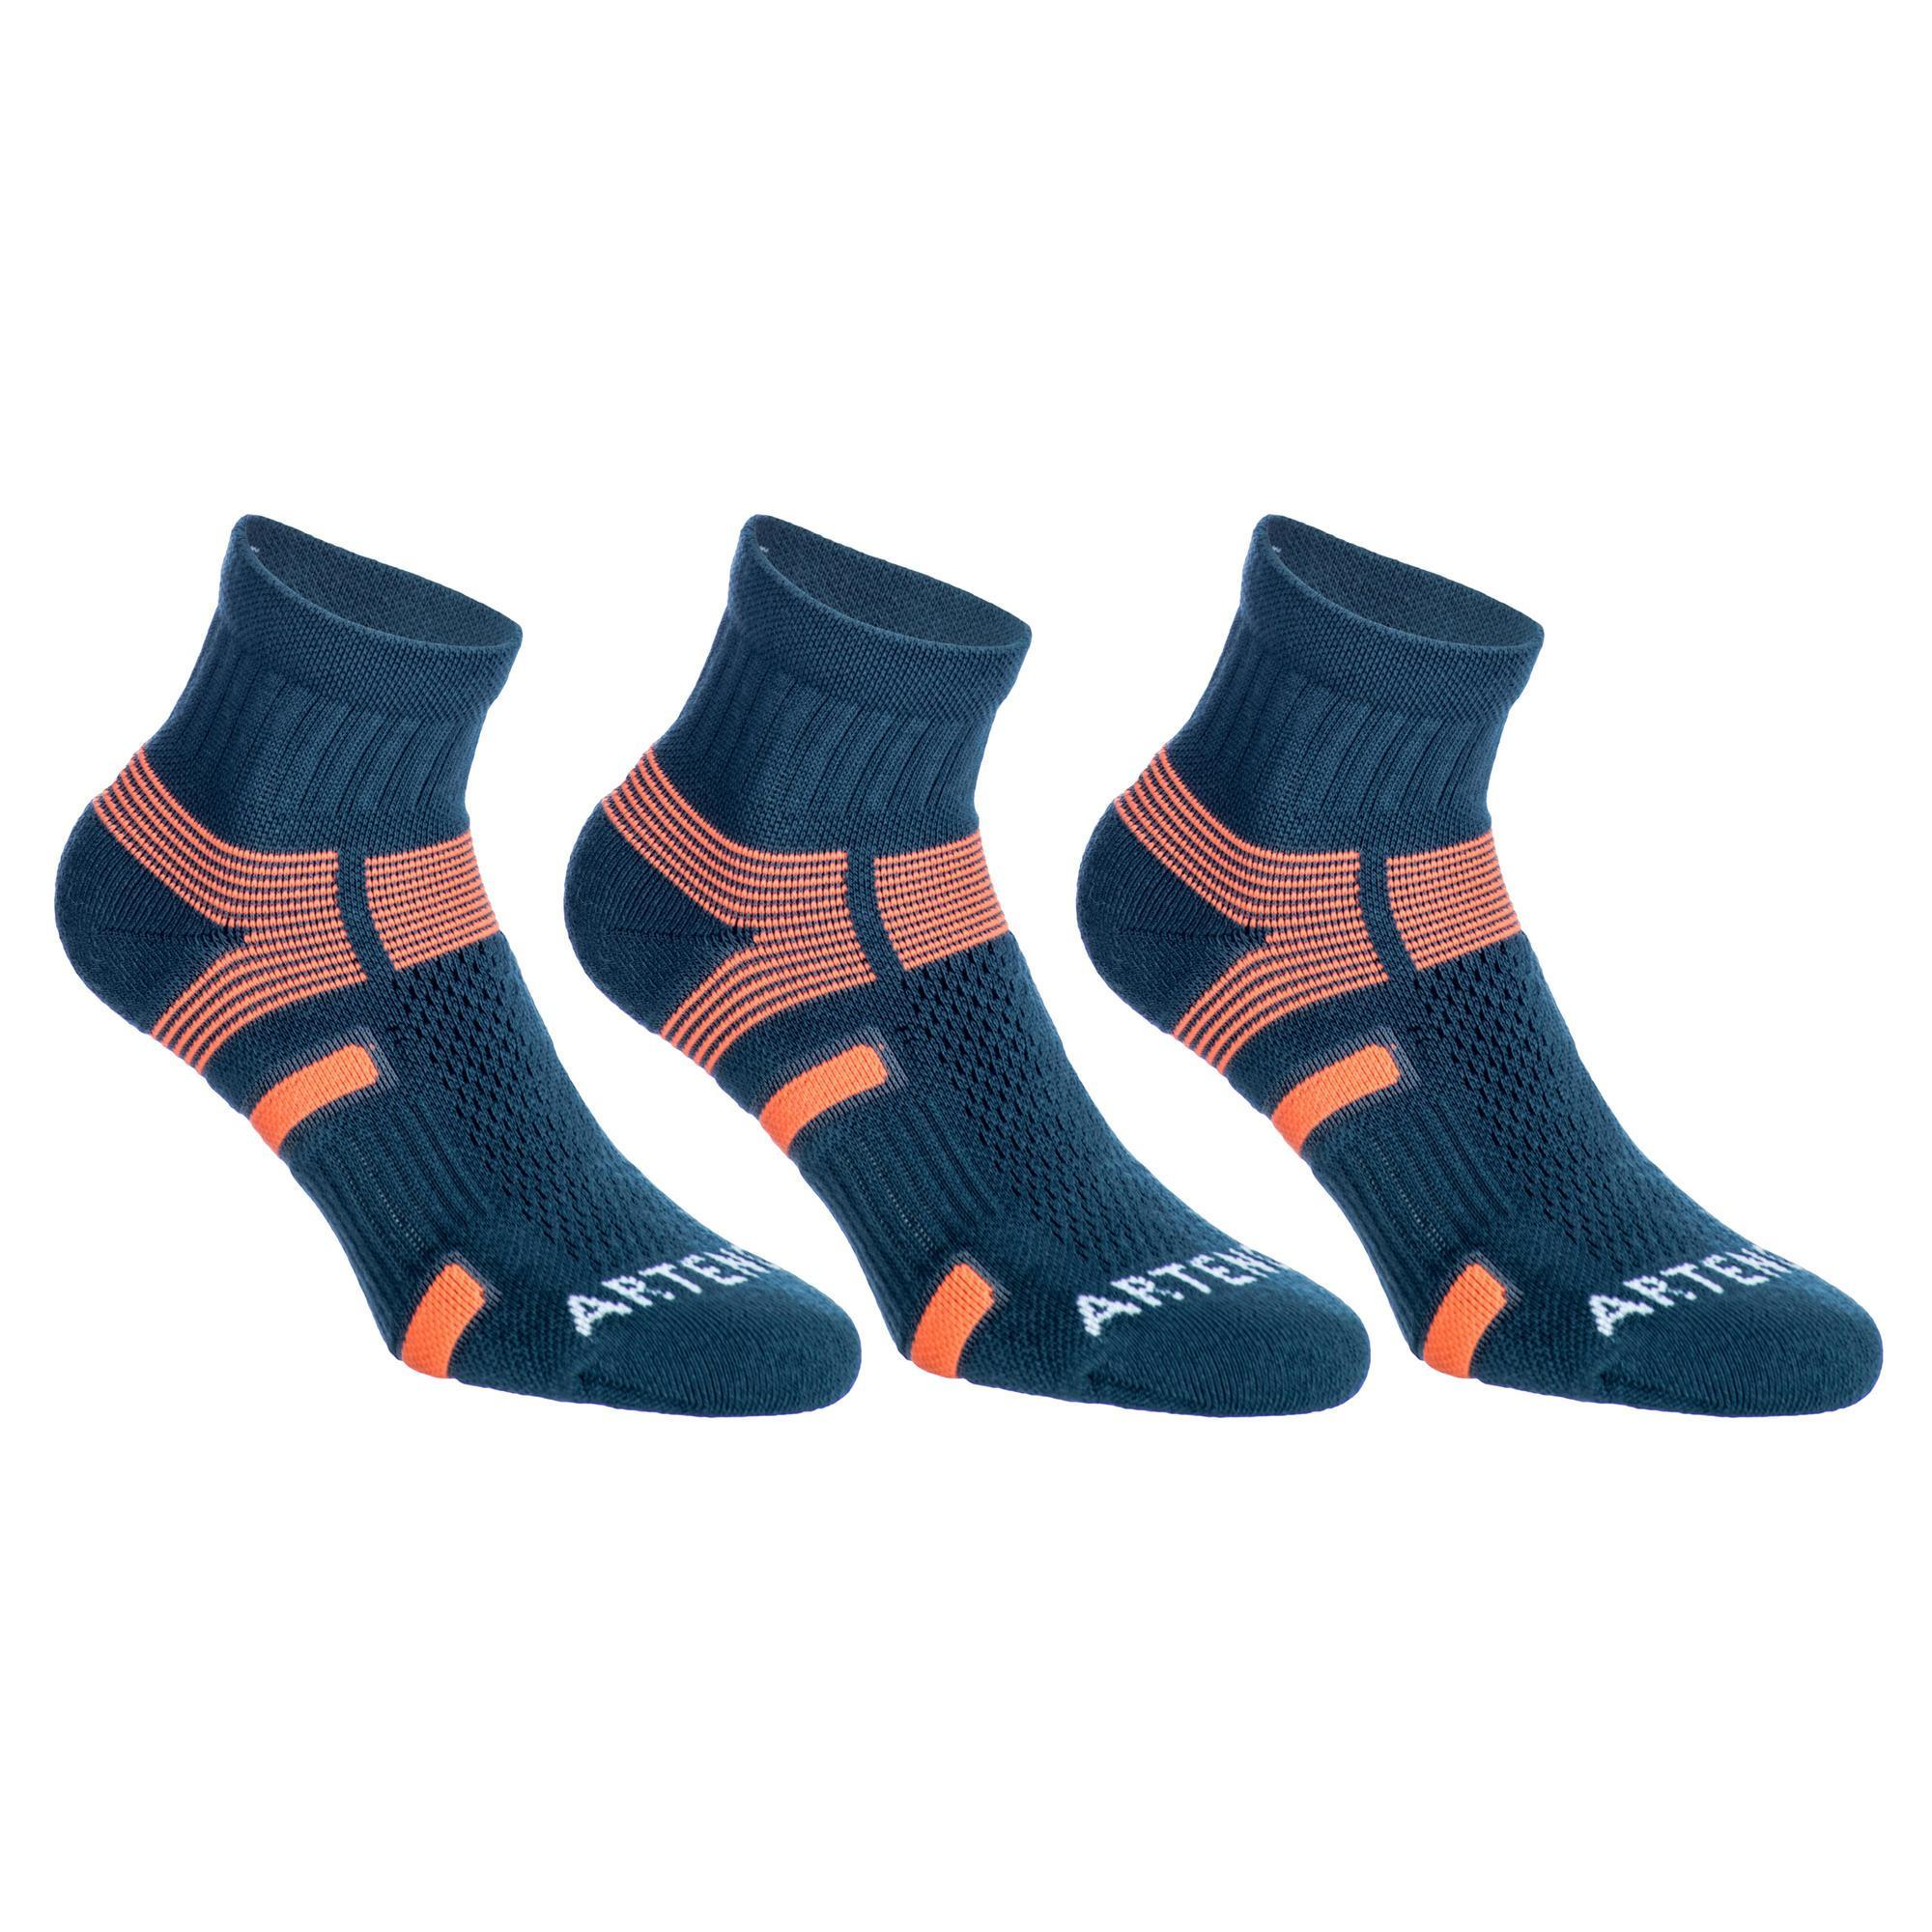 Tennissocken RS 560 Mid 3er-Pack grau/orange Artengo | Sportbekleidung > Funktionswäsche > Sportsocken | Grau - Orange | Pikee | Artengo